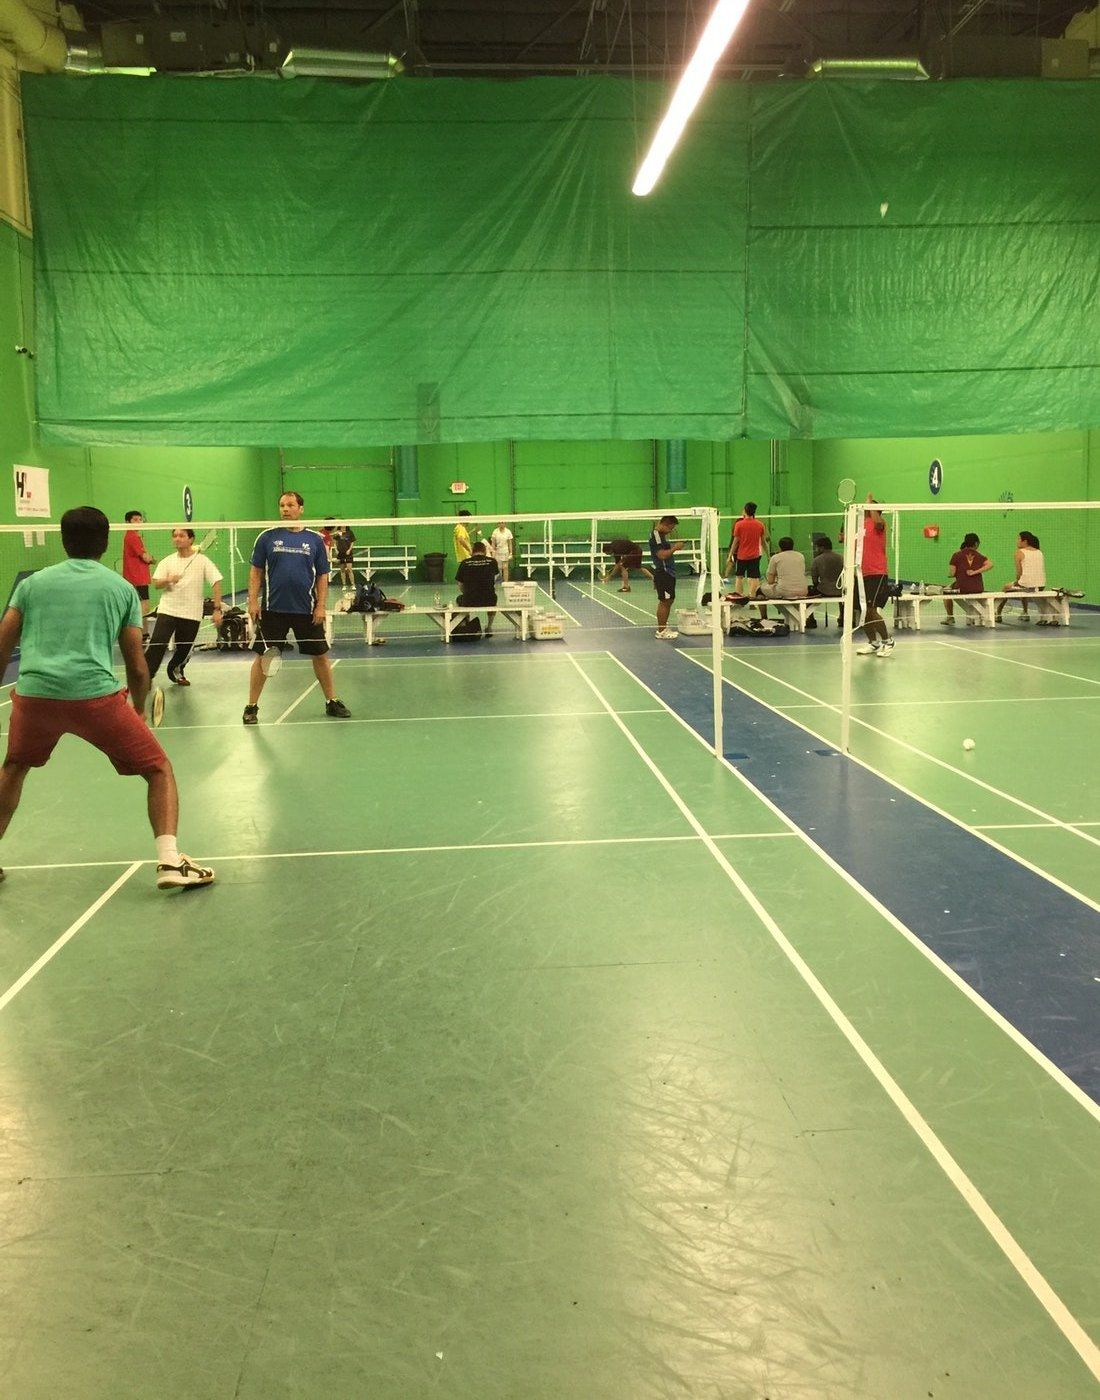 Arizona Badminton Center Sports Complexes Play in the